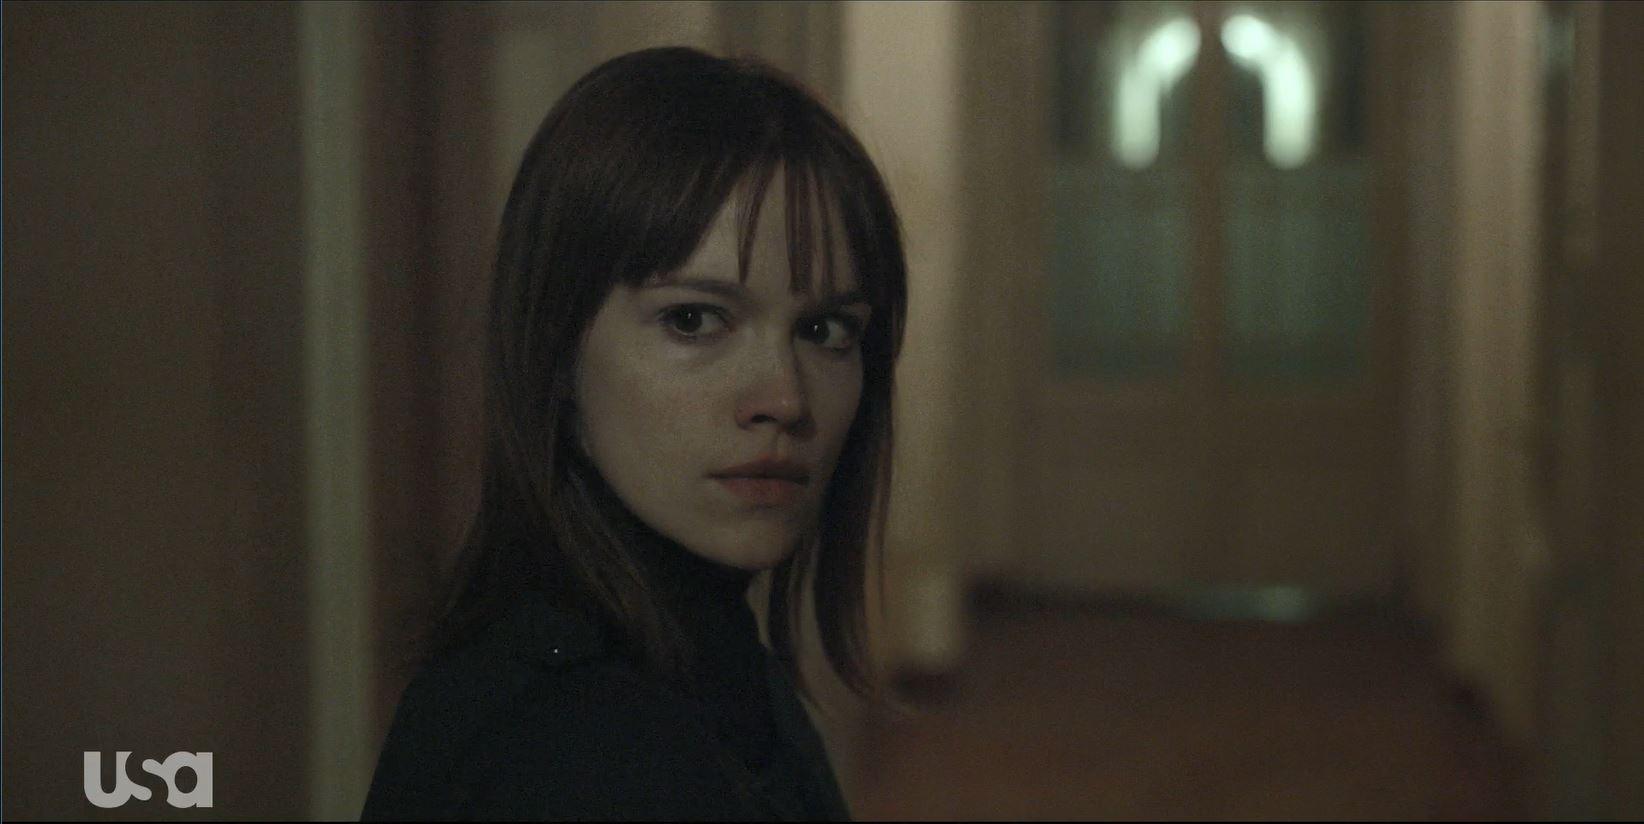 Treadstone Review - Emilia Schule as Petra